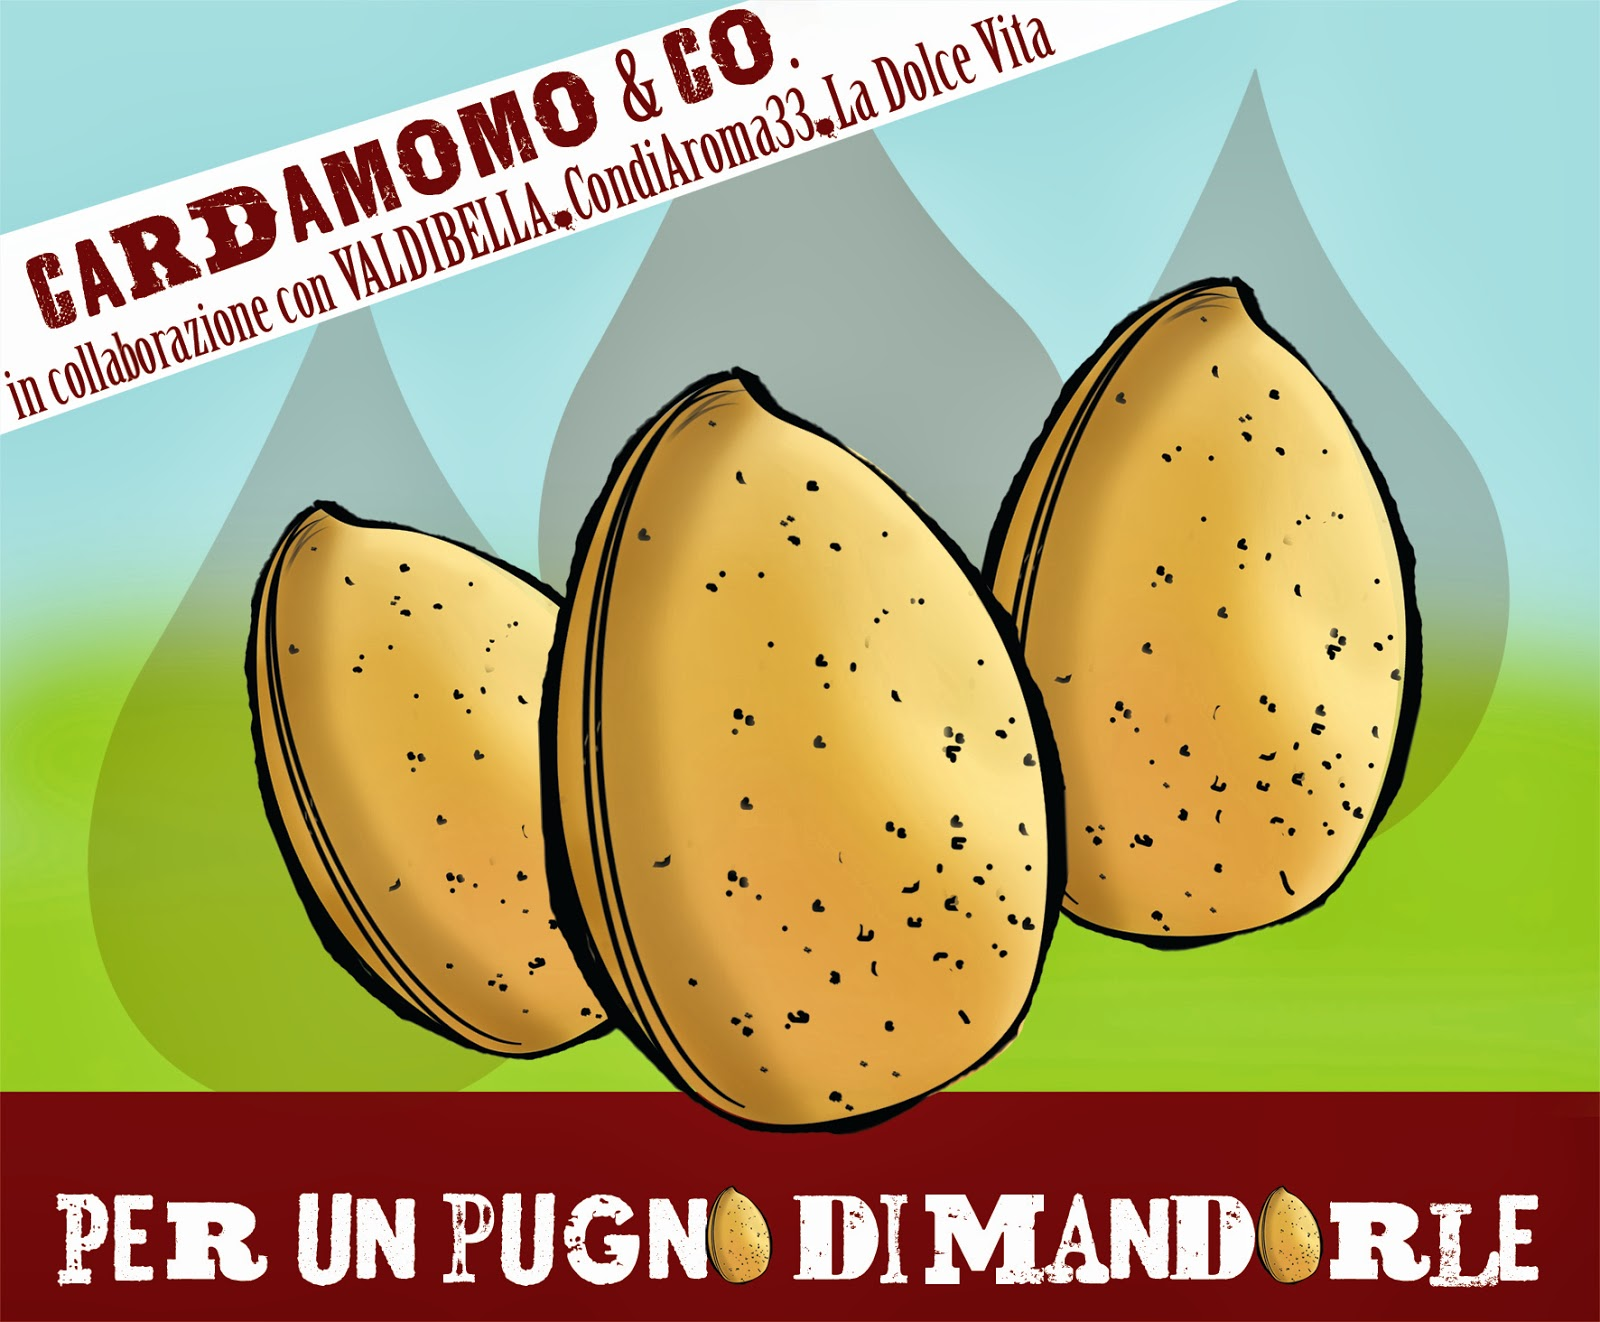 http://saporiesaporifantasie.blogspot.it/2014/03/pasta-al-nero-di-seppie-pomodorini-e-un.html